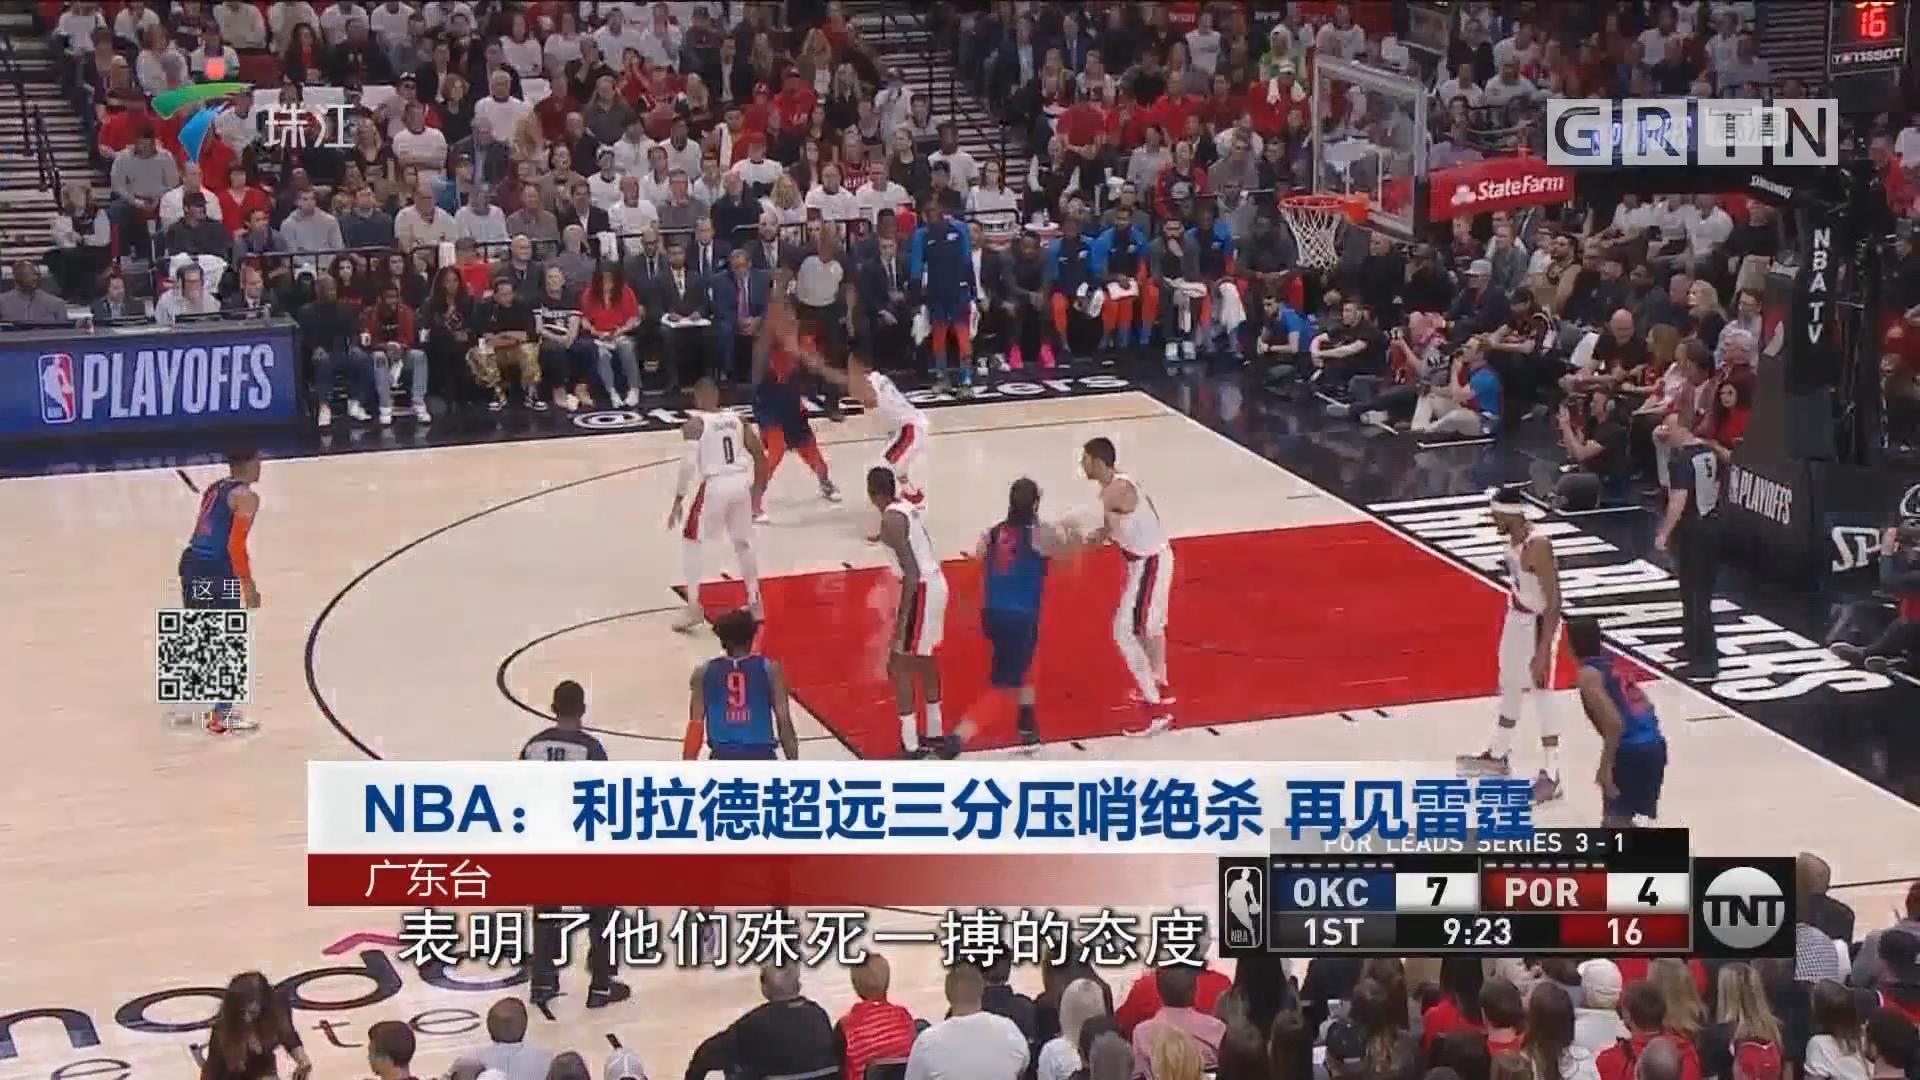 NBA:利拉德超远三分压哨绝杀 再见雷霆